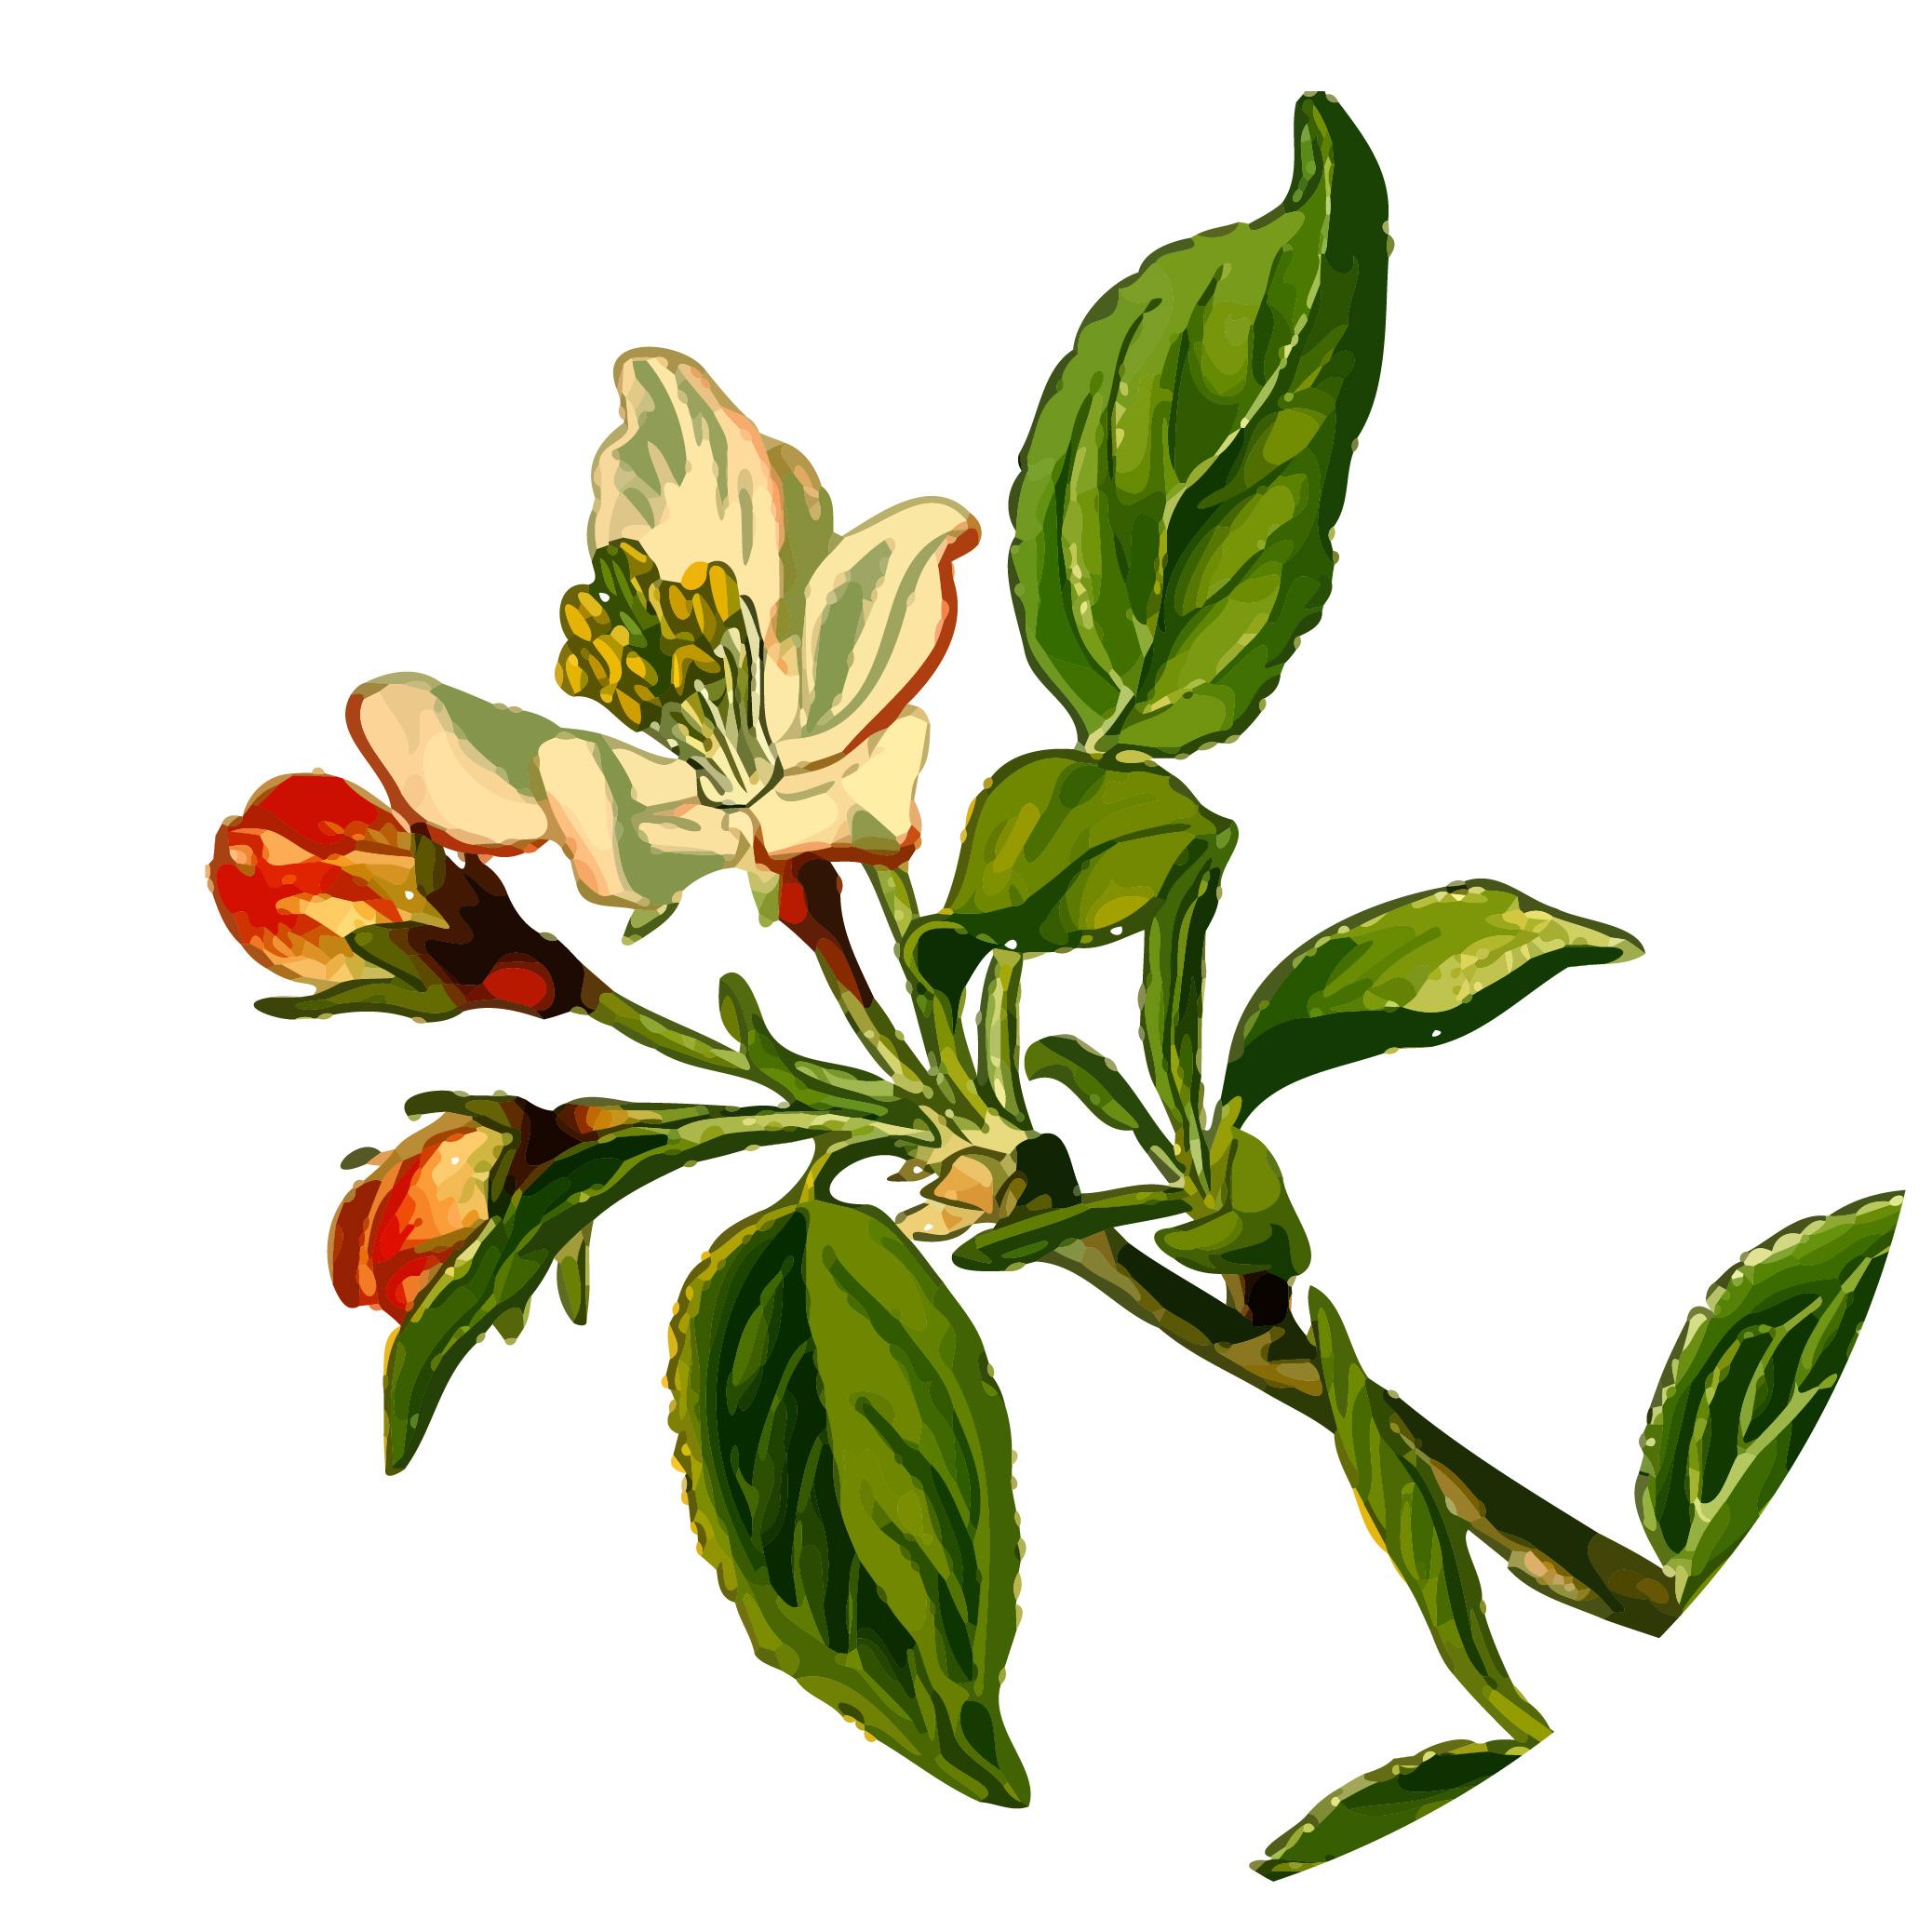 apple-1300026.jpg